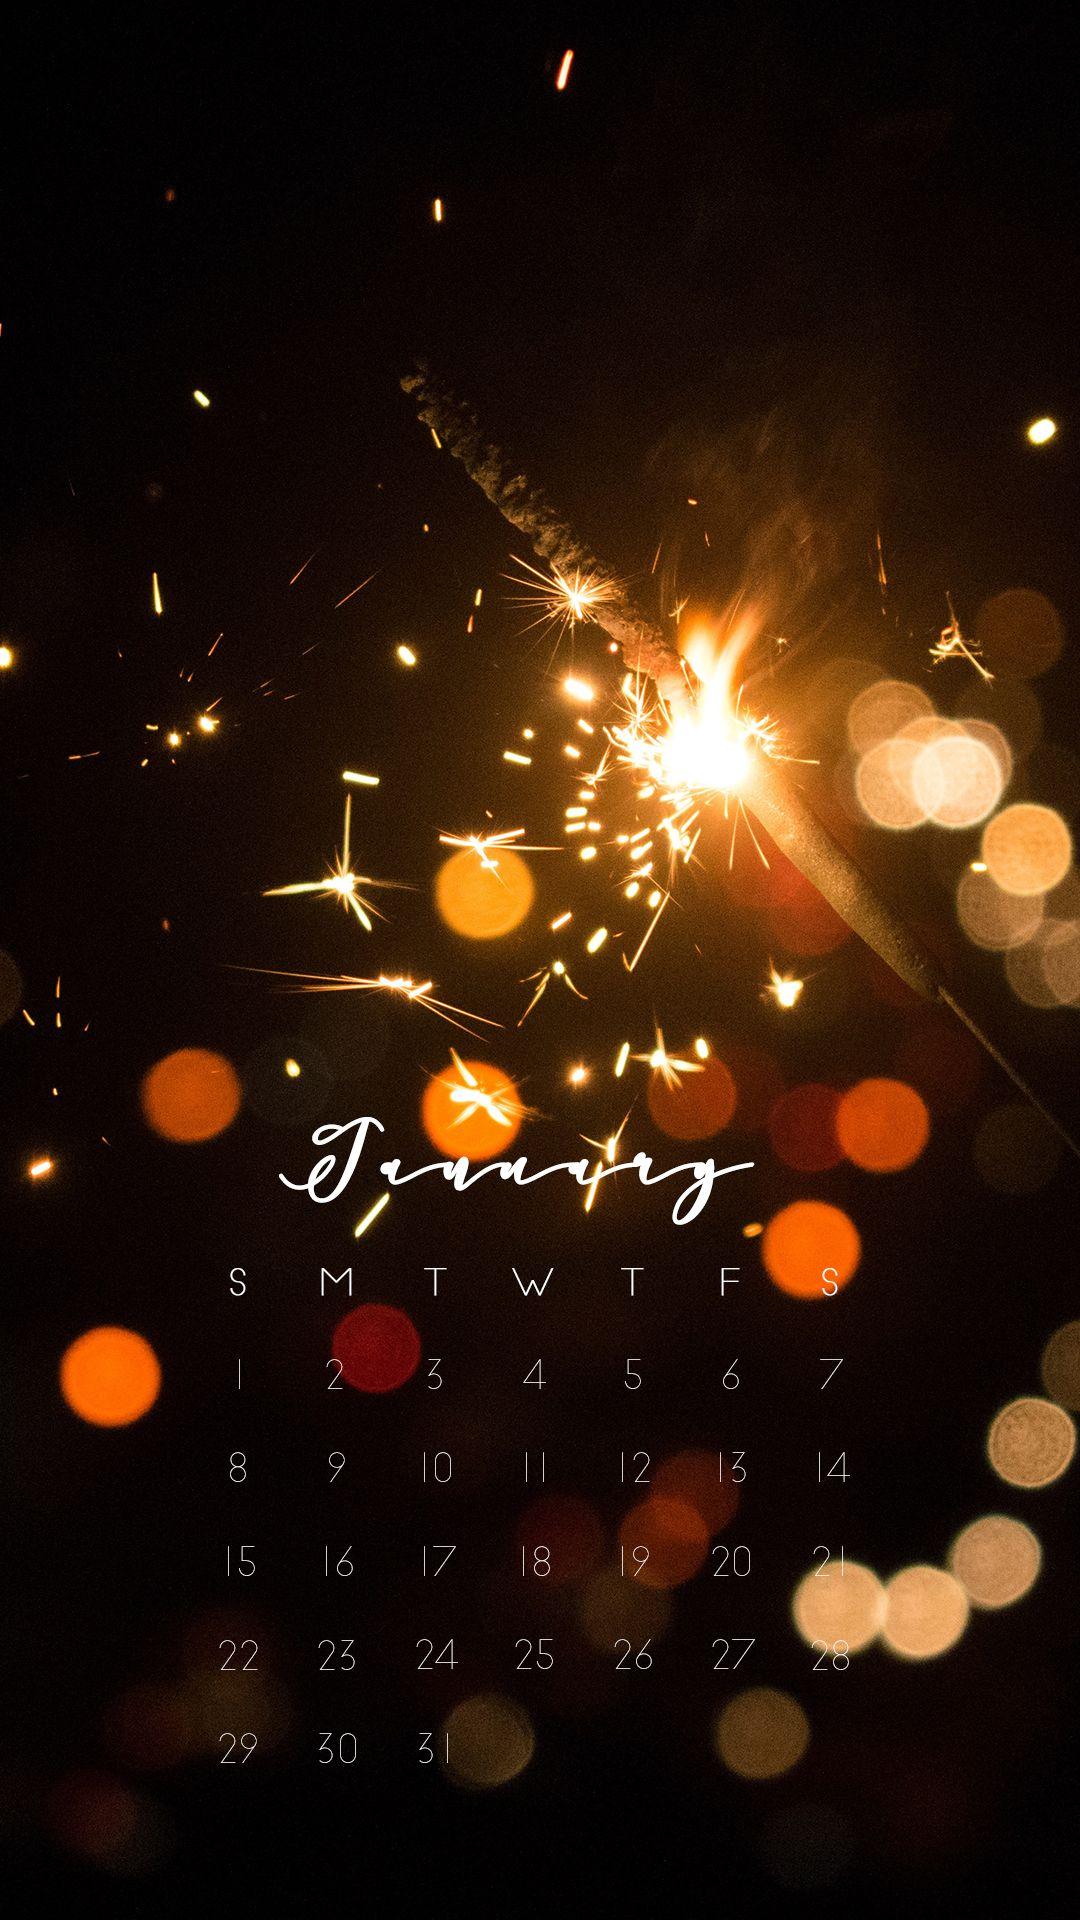 Sparkler Celebration Sparks January Calendar 2017